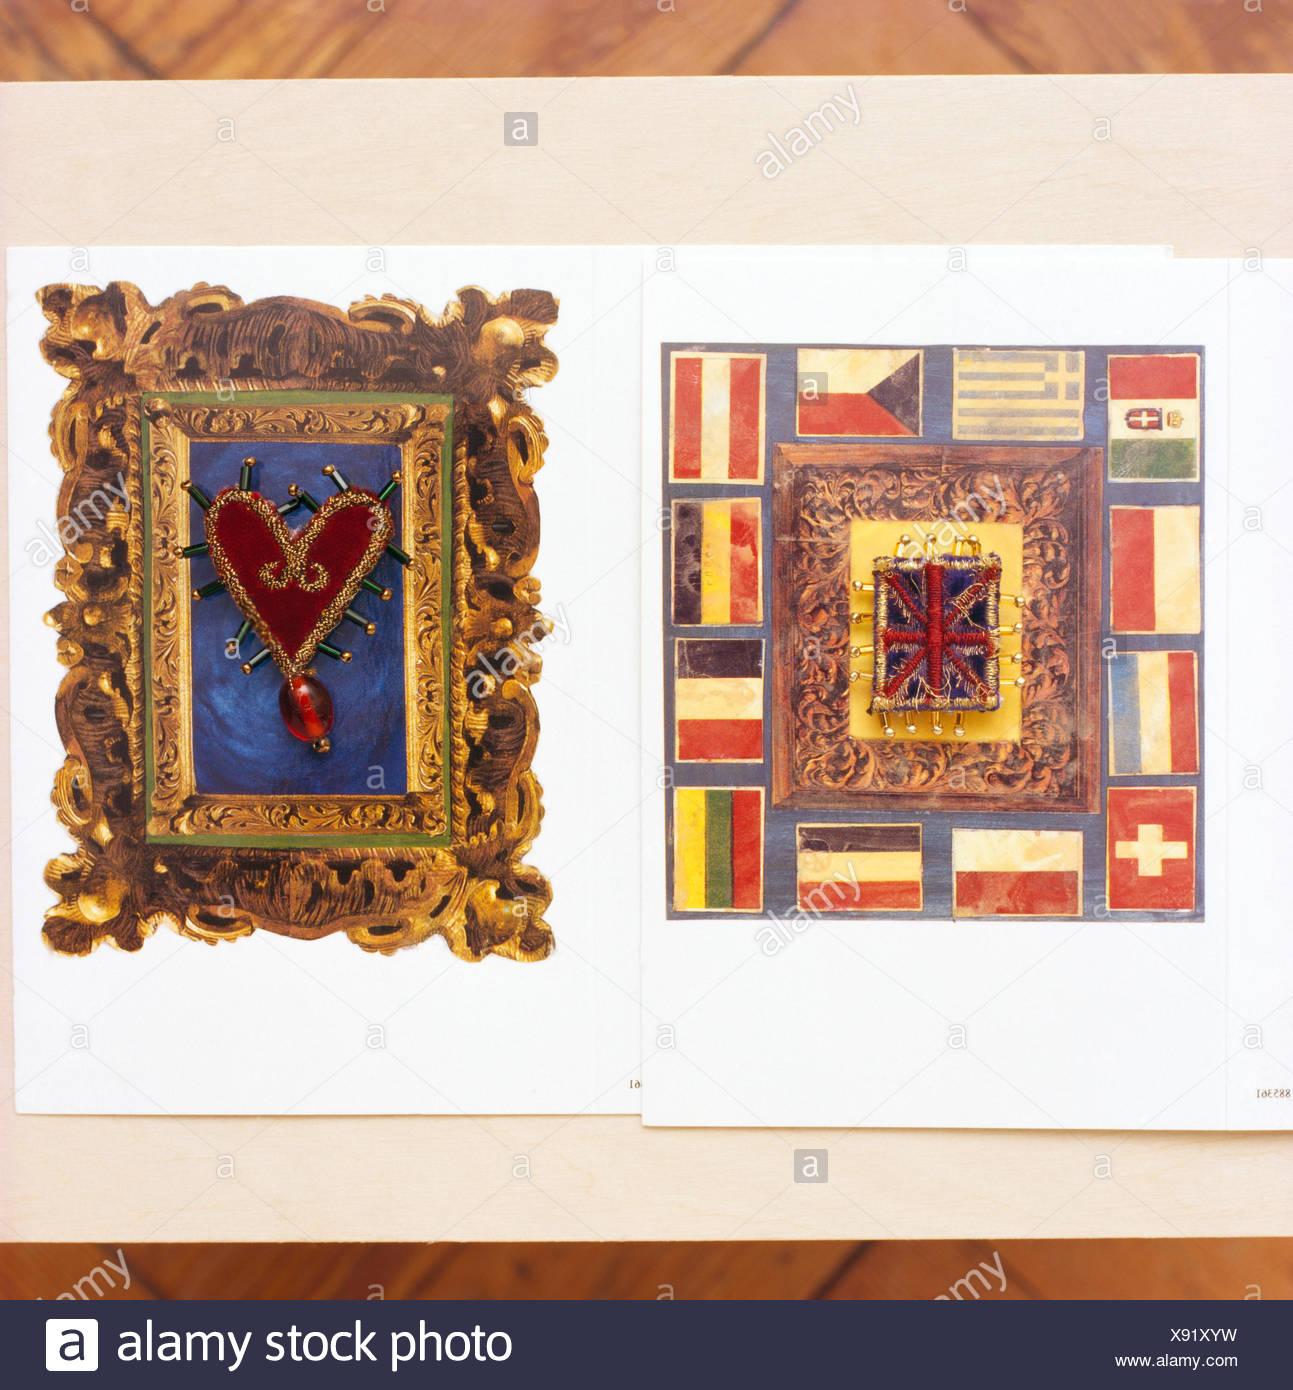 Ornate Frames Stockfotos & Ornate Frames Bilder - Alamy